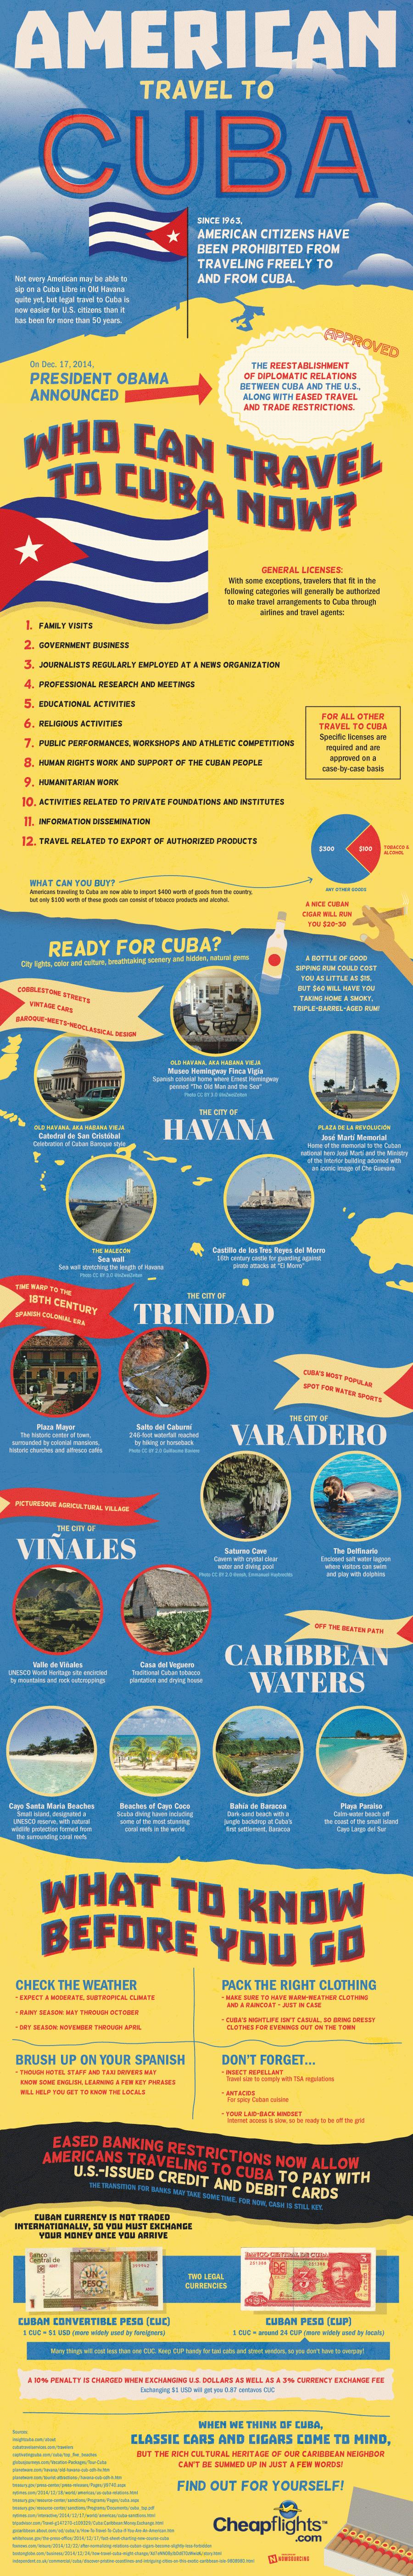 American travel to Cuba 1